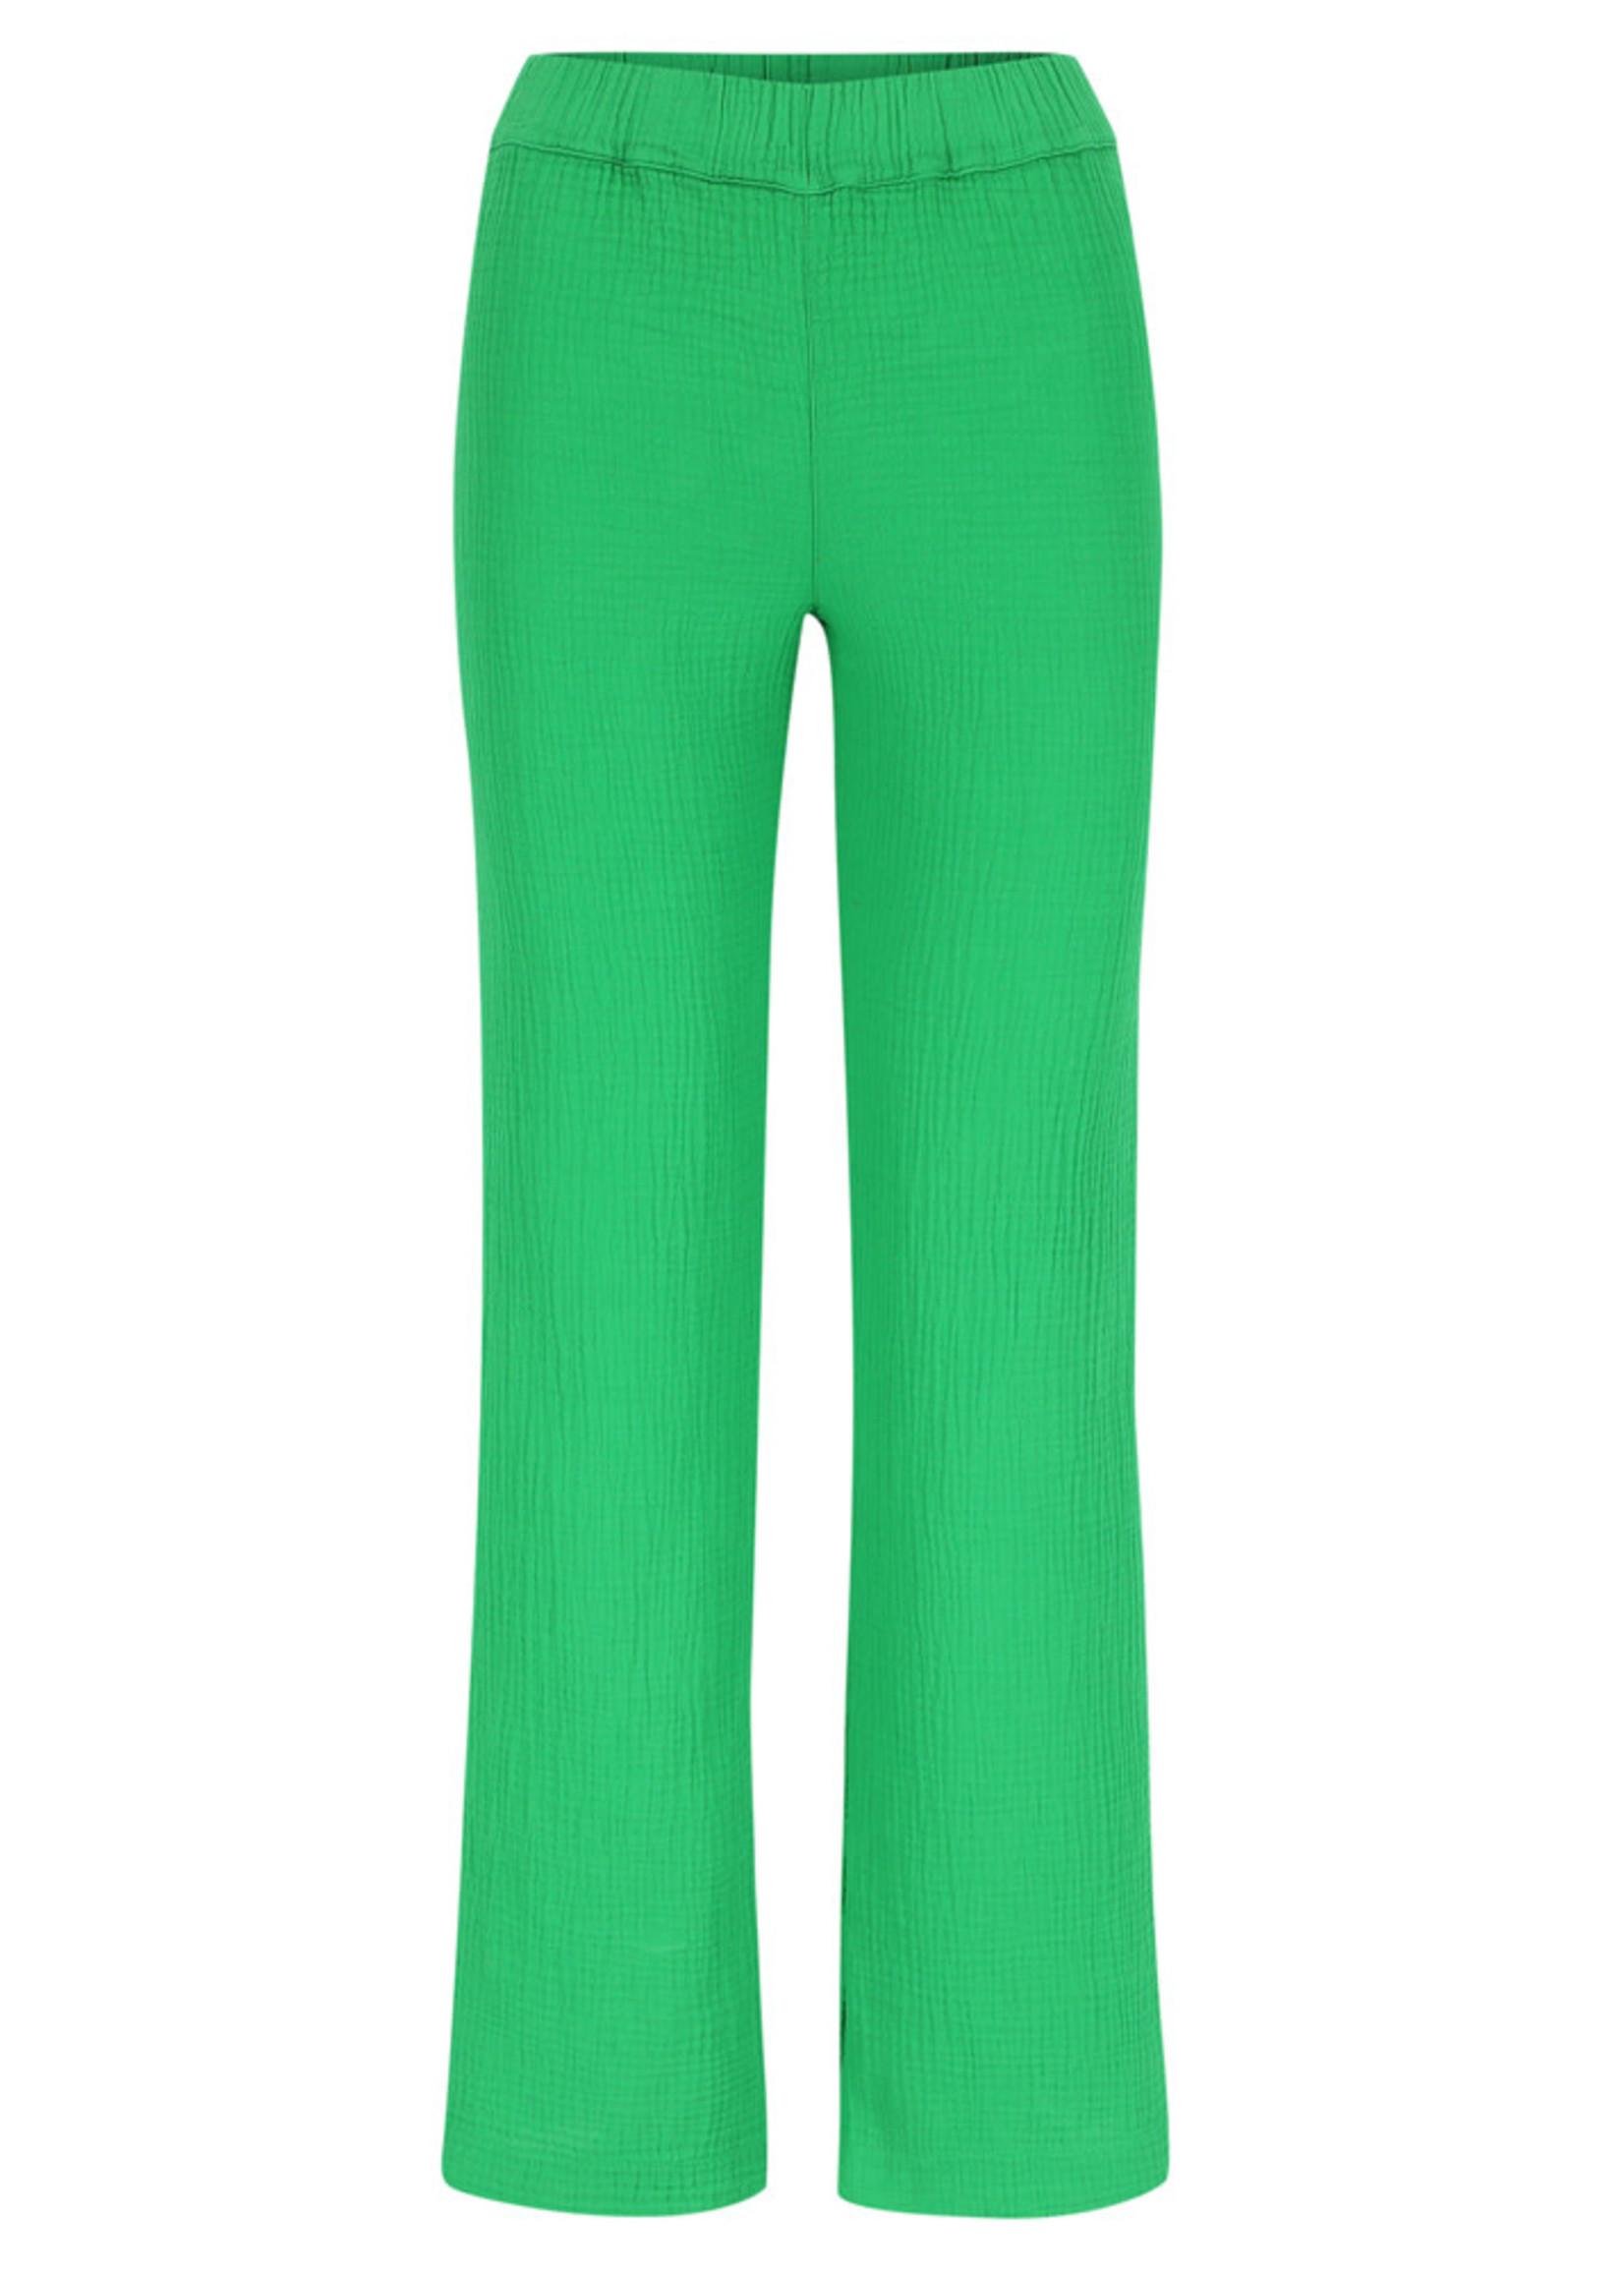 Heavenly Poppi Tetra - Apple Green